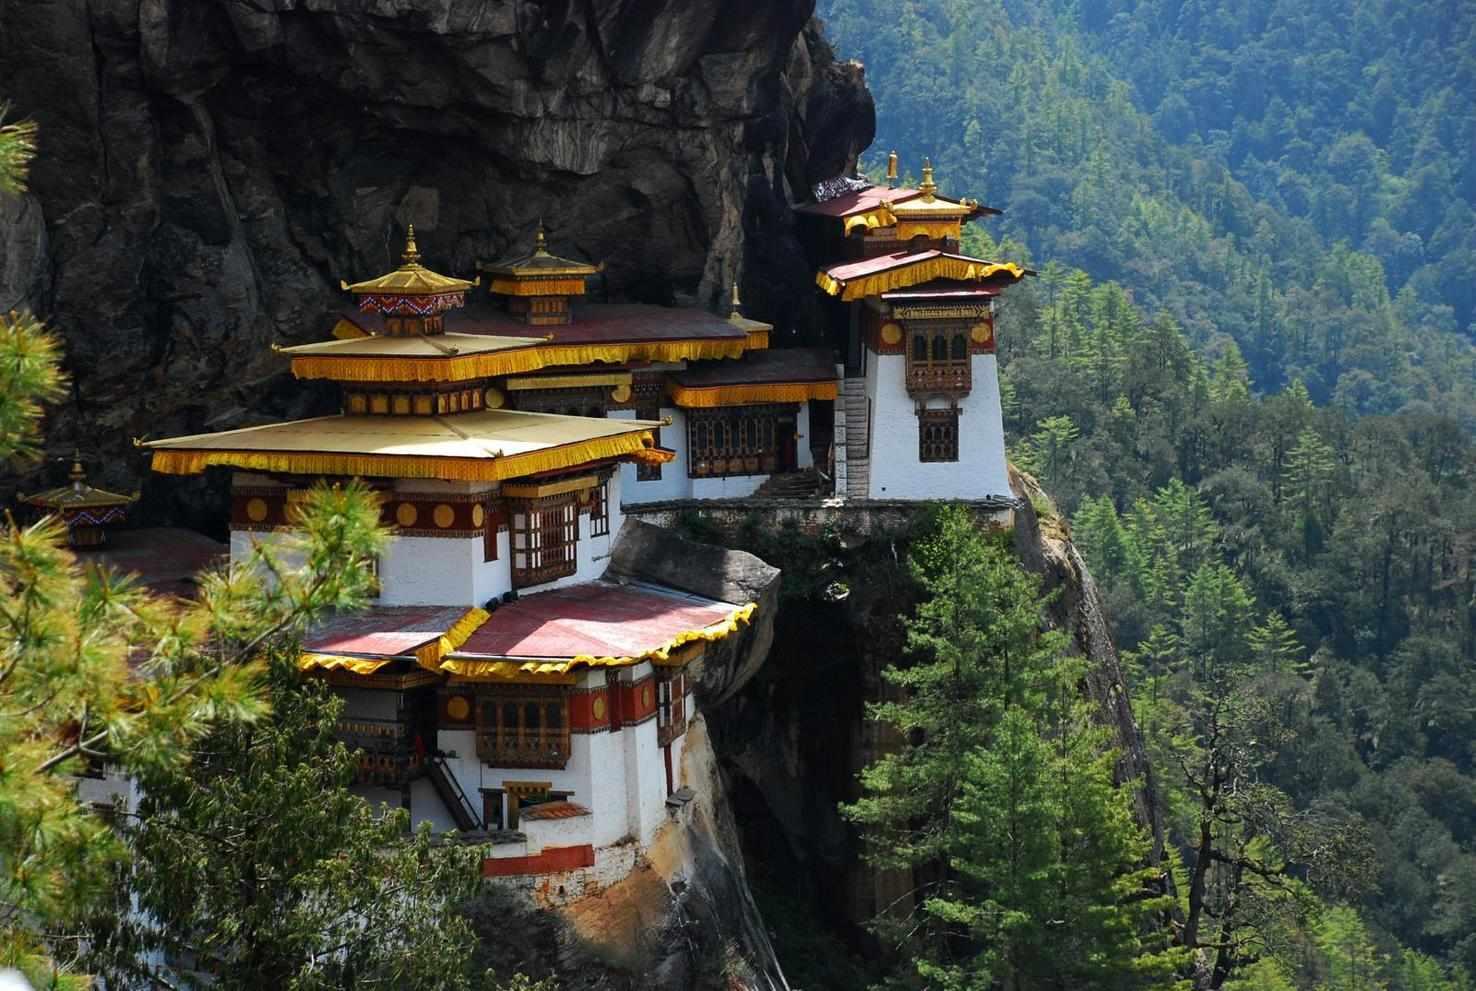 bhutan tour2.jpg